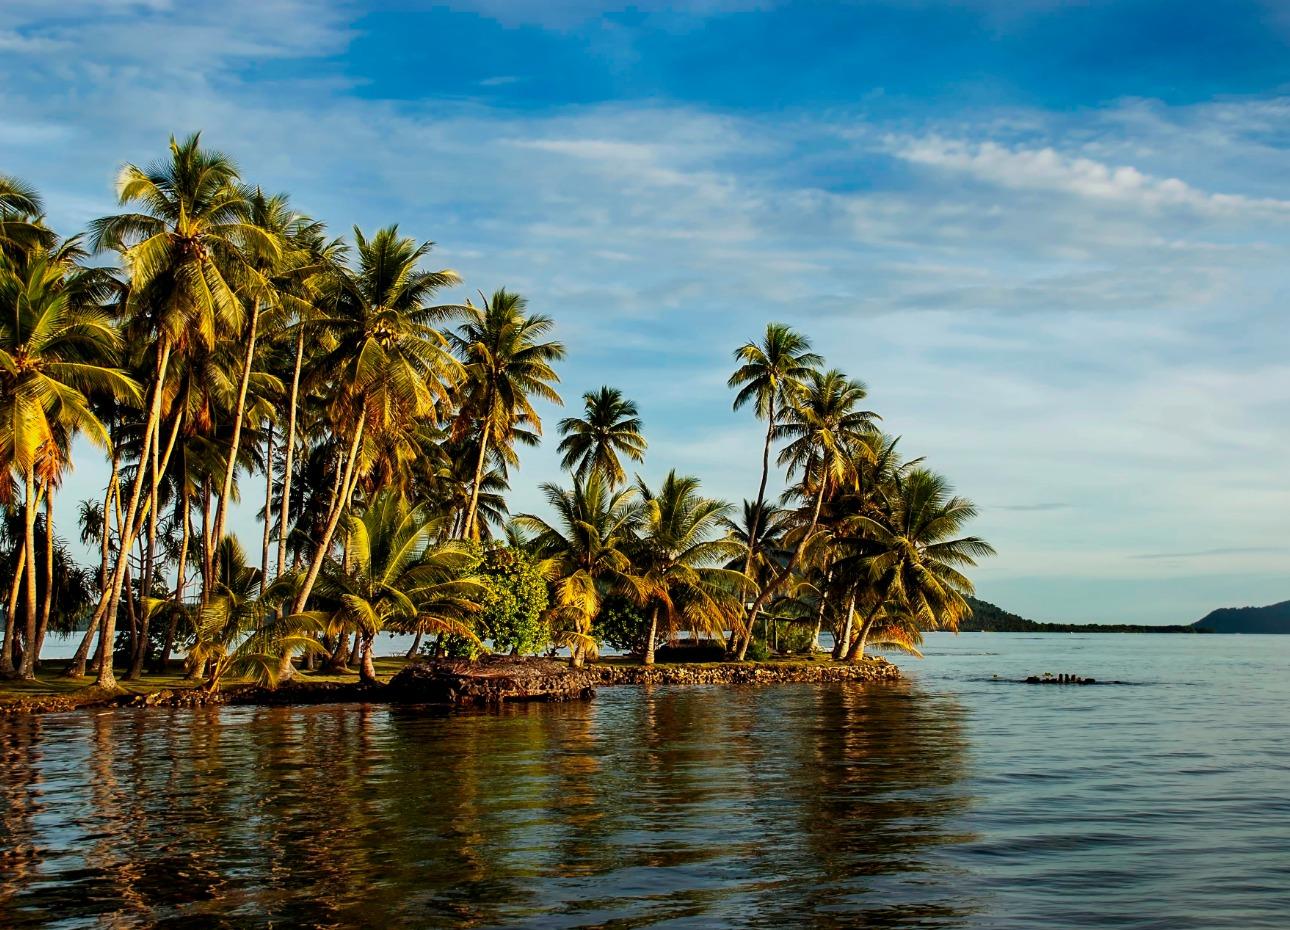 Truk Lagoon island view